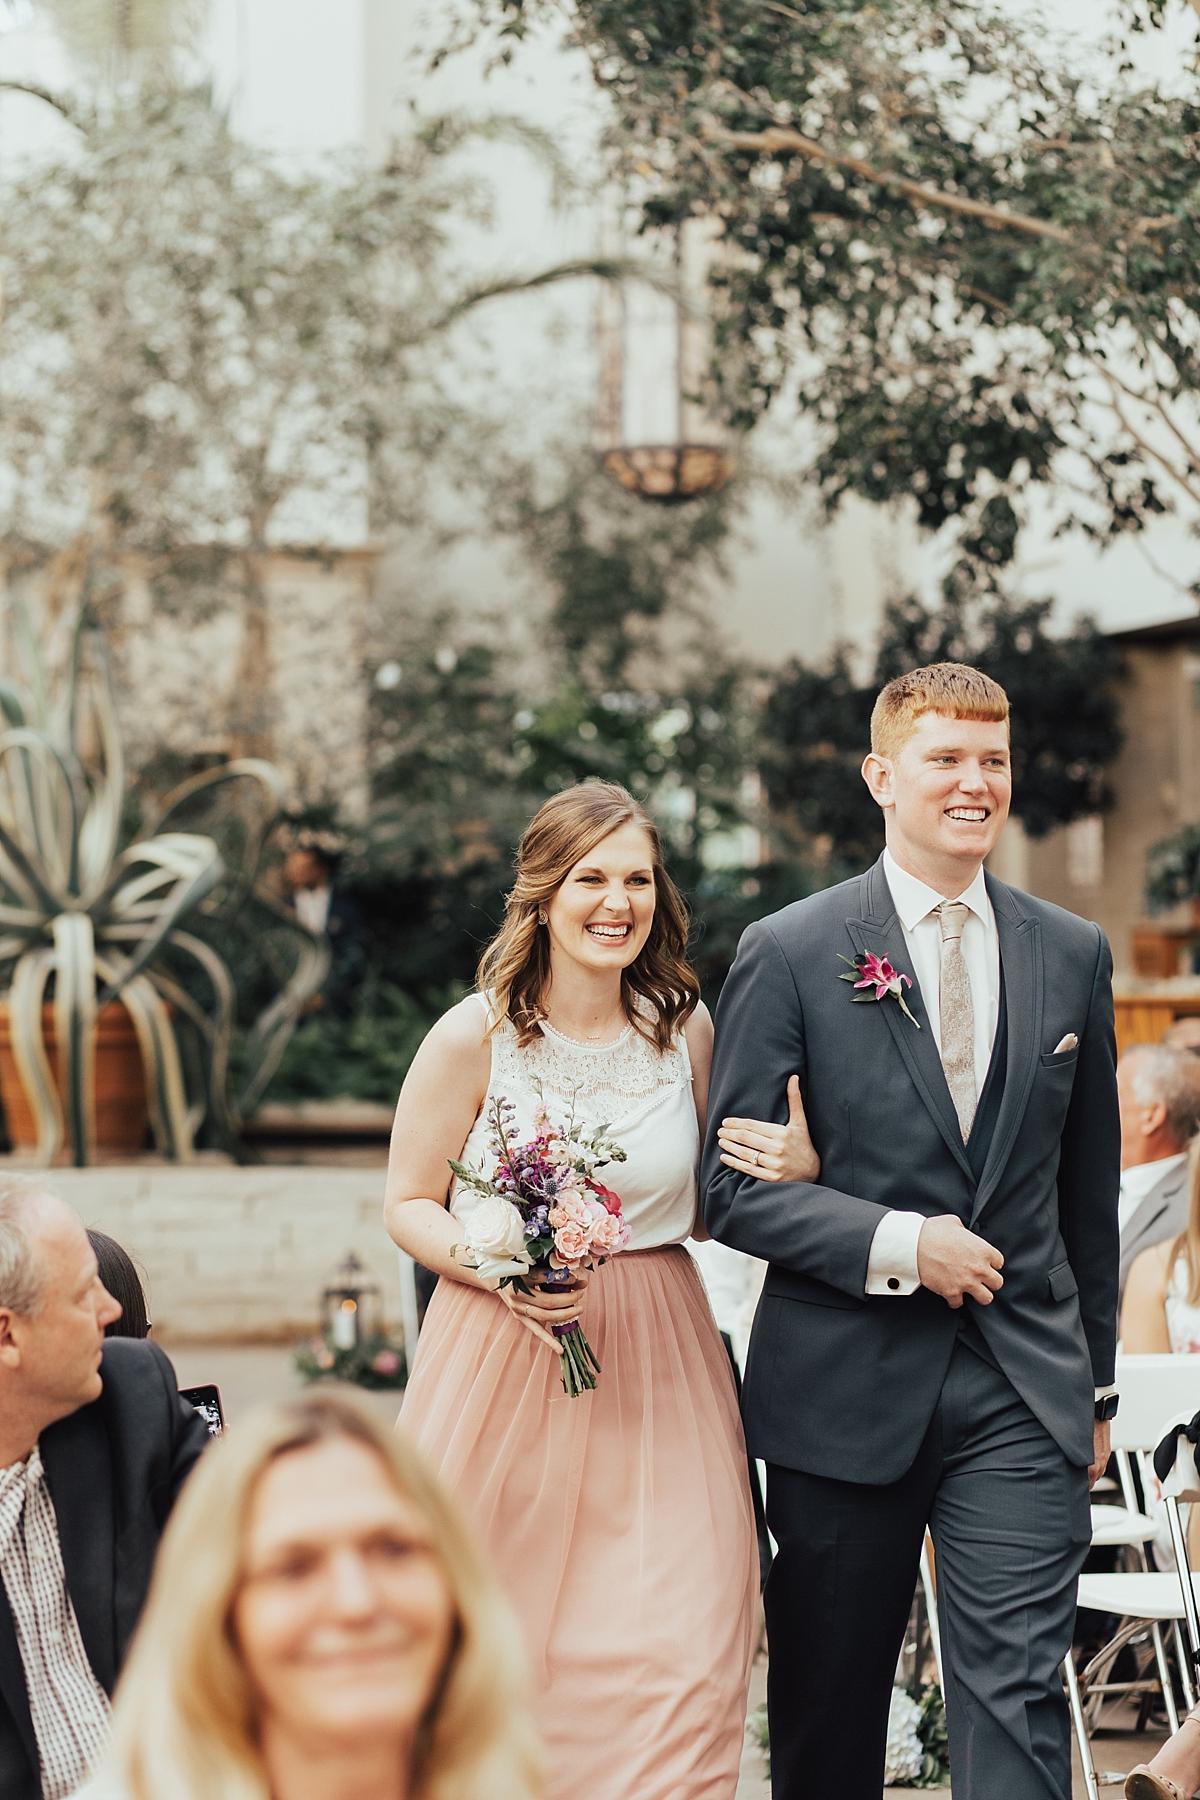 Rachel Wakefield Los Angeles Wedding Photographer Jordane and Jake White-323.jpg